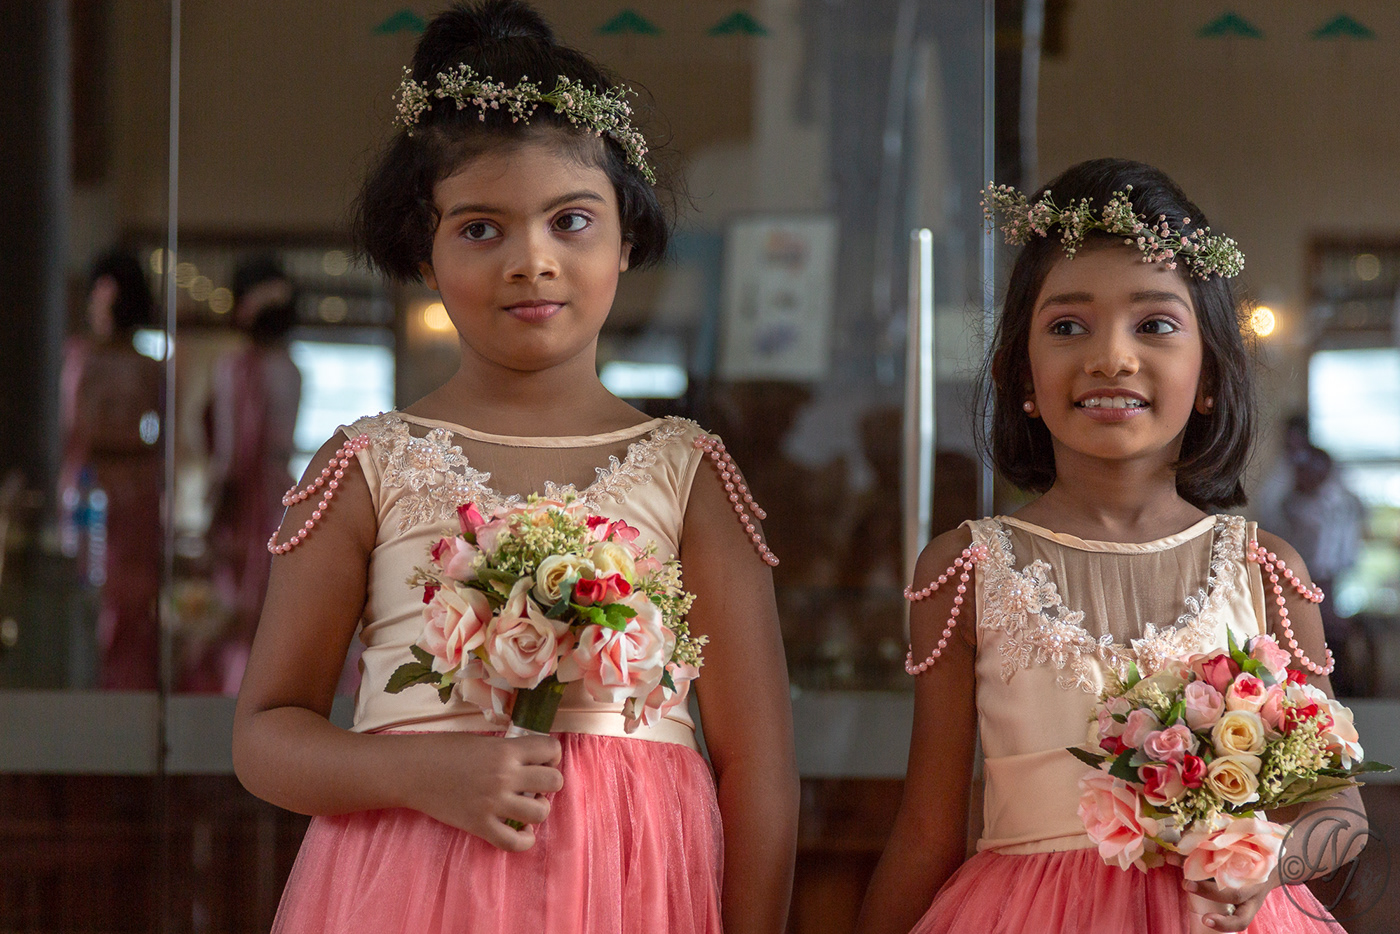 Kandyan Wedding Table Decorations